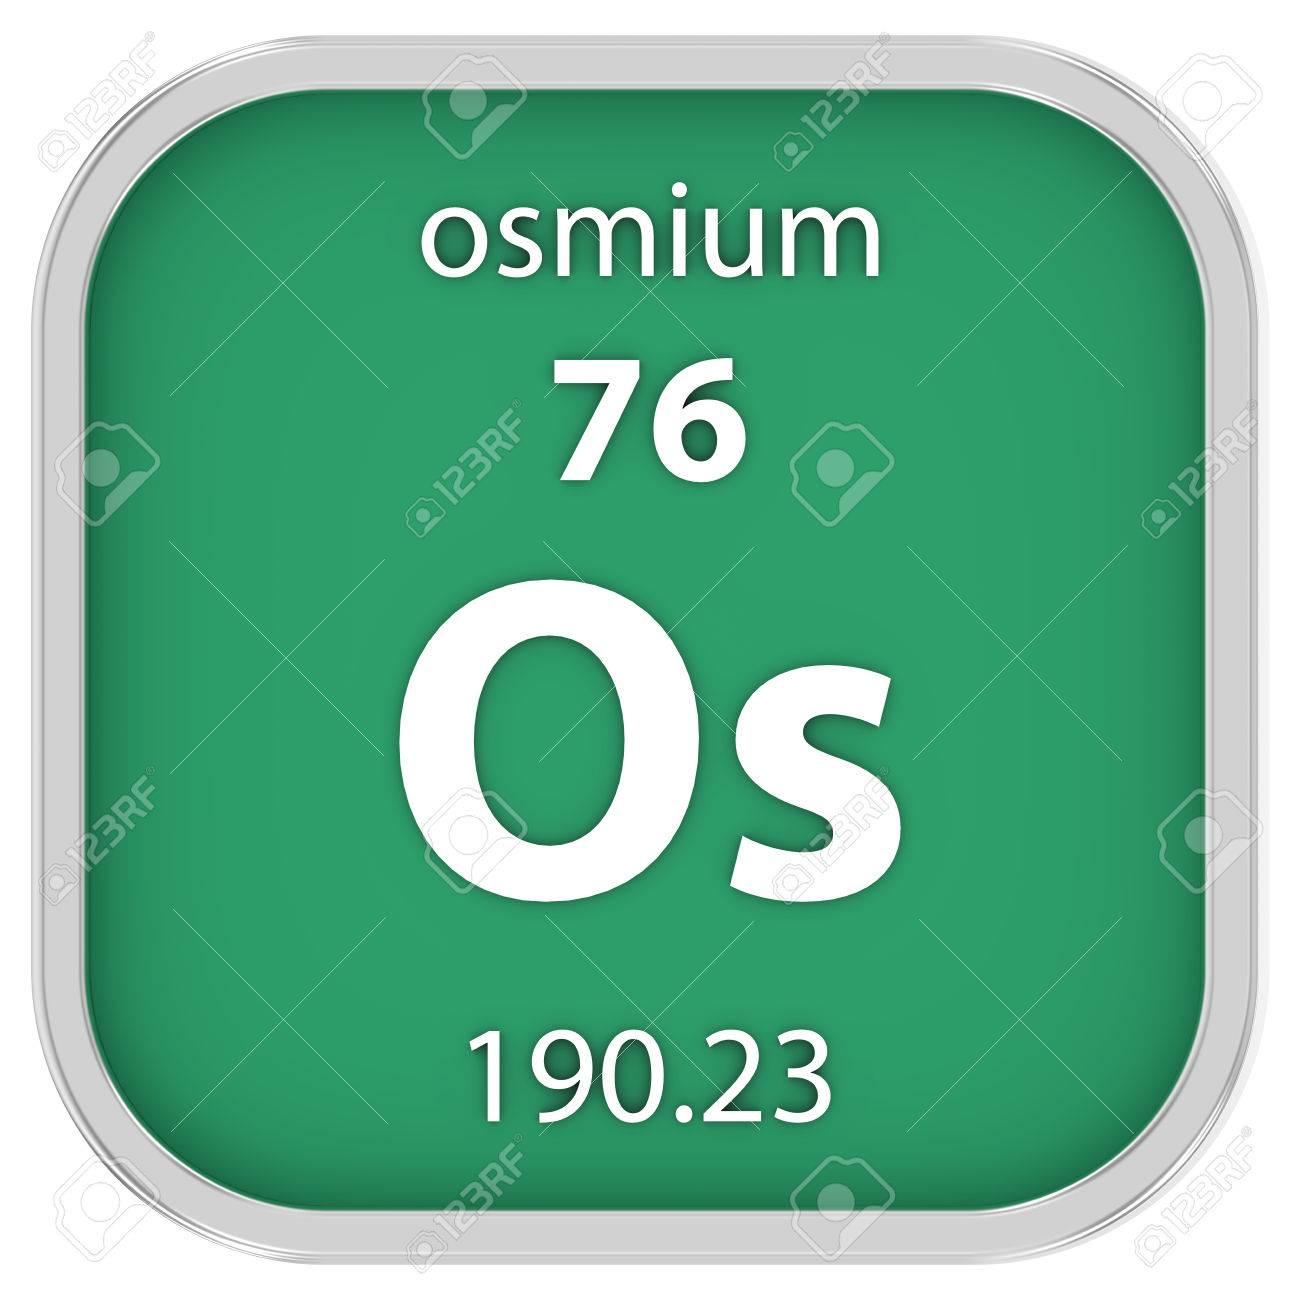 Osmium material on the periodic table stock photo picture and osmium material on the periodic table stock photo 41093553 urtaz Images